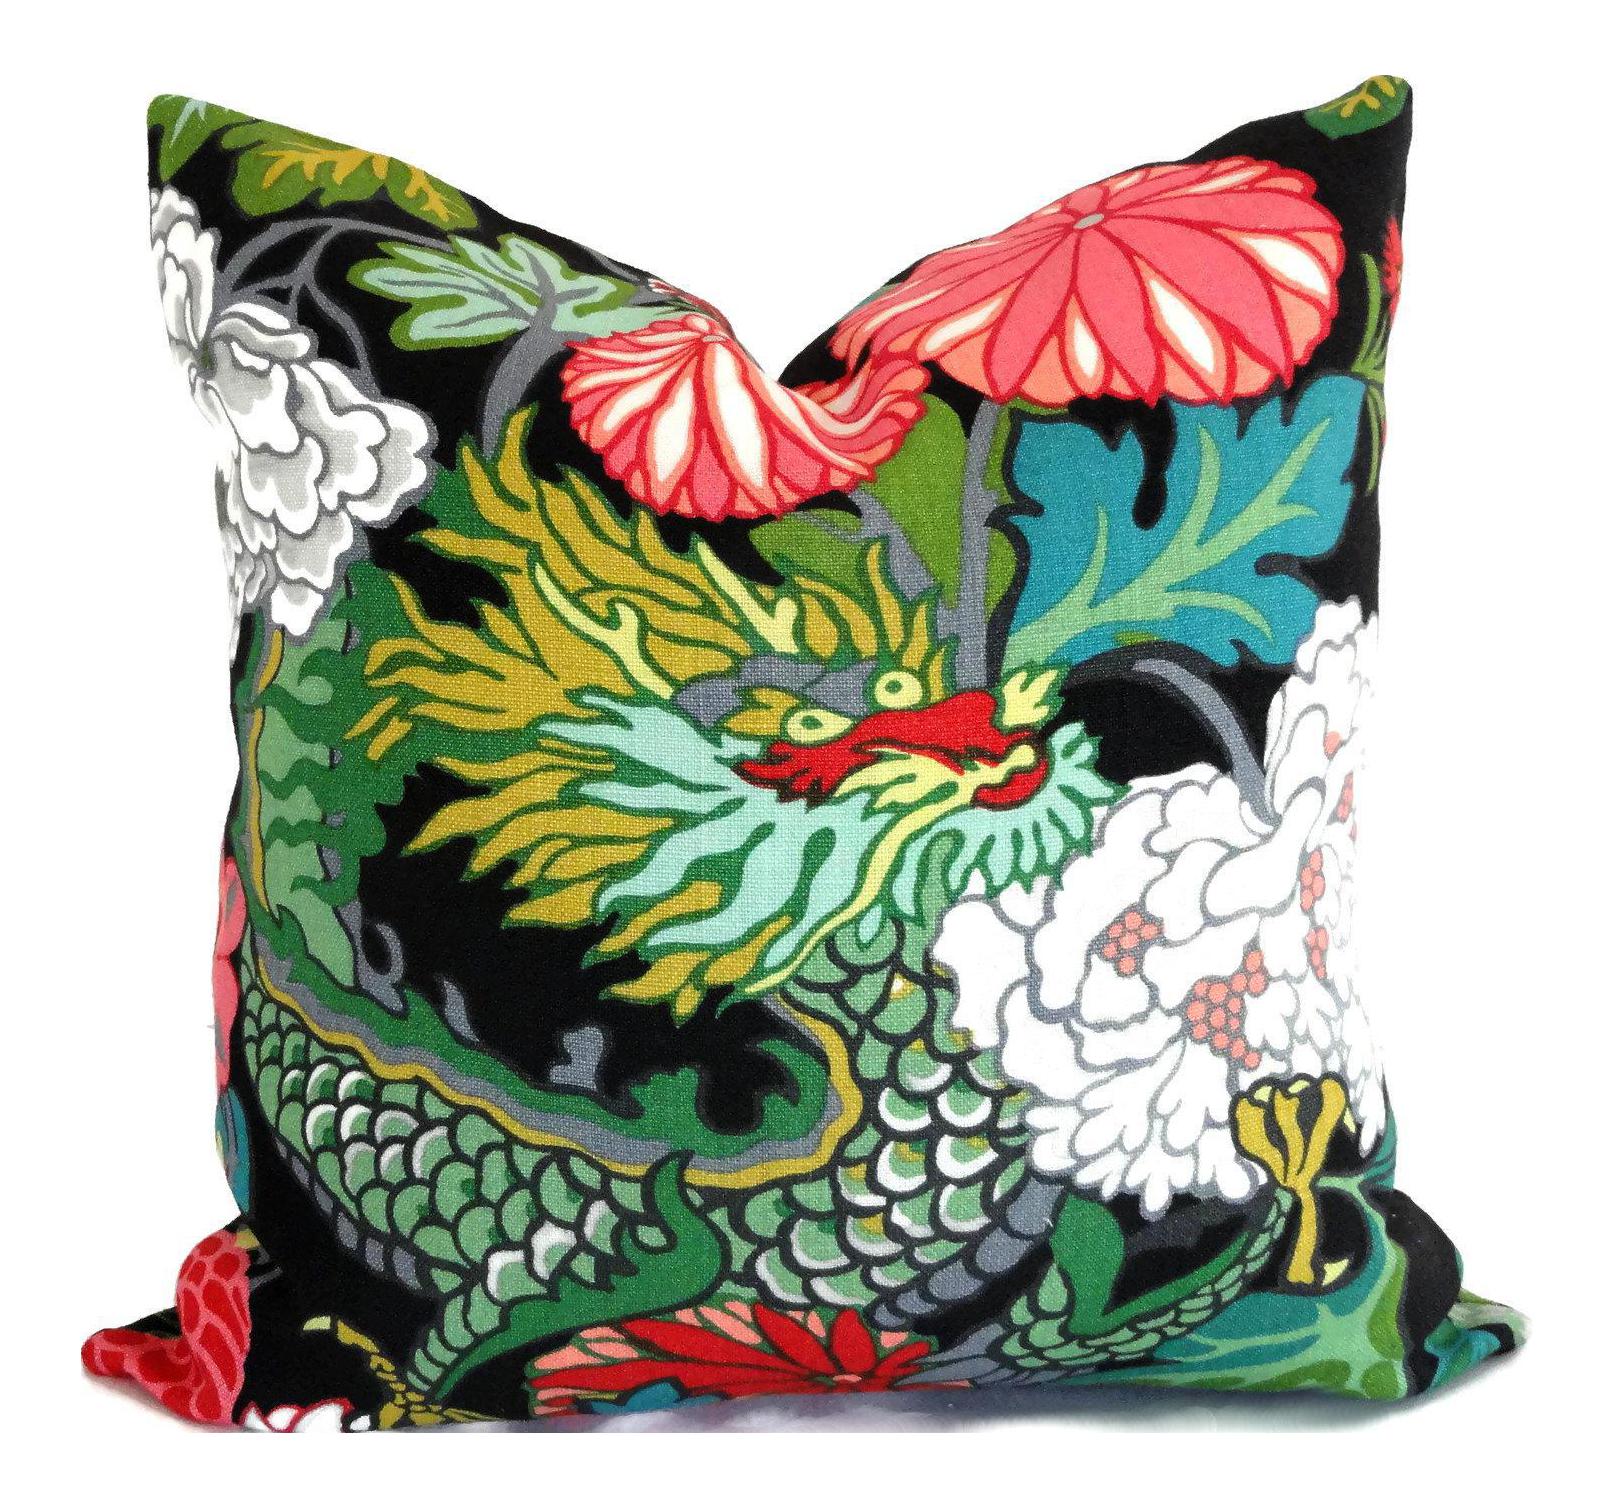 Throw Pillow Case 20 X 20 : Ebony Schumacher Chiang Mai Dragon Decorative Pillow Covers, 20x20 Chairish